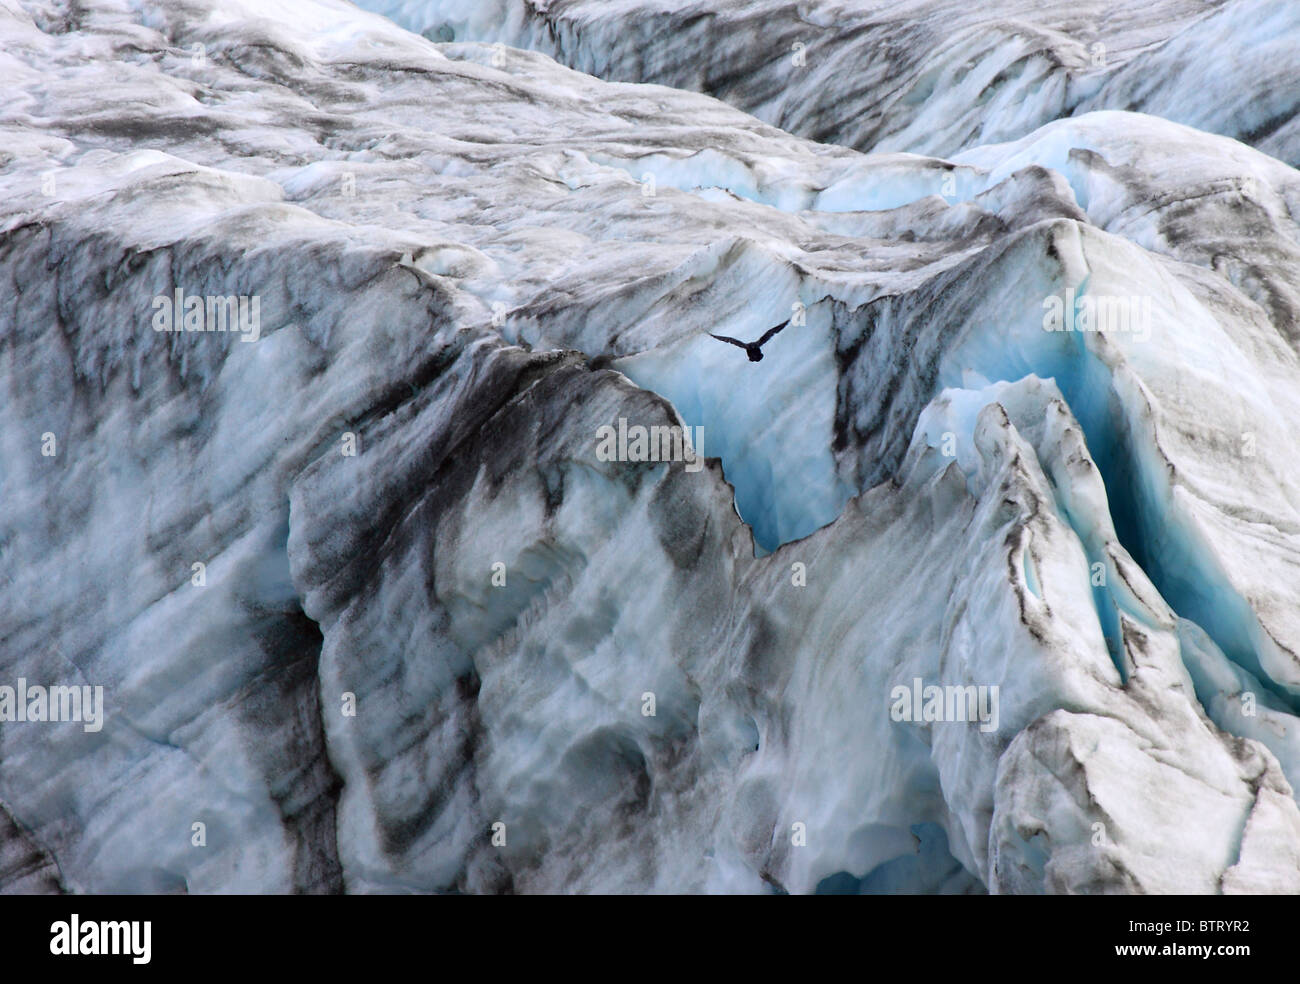 gemeinsamen Raven Corvus Corax Eiskappe überfliegen Stockbild